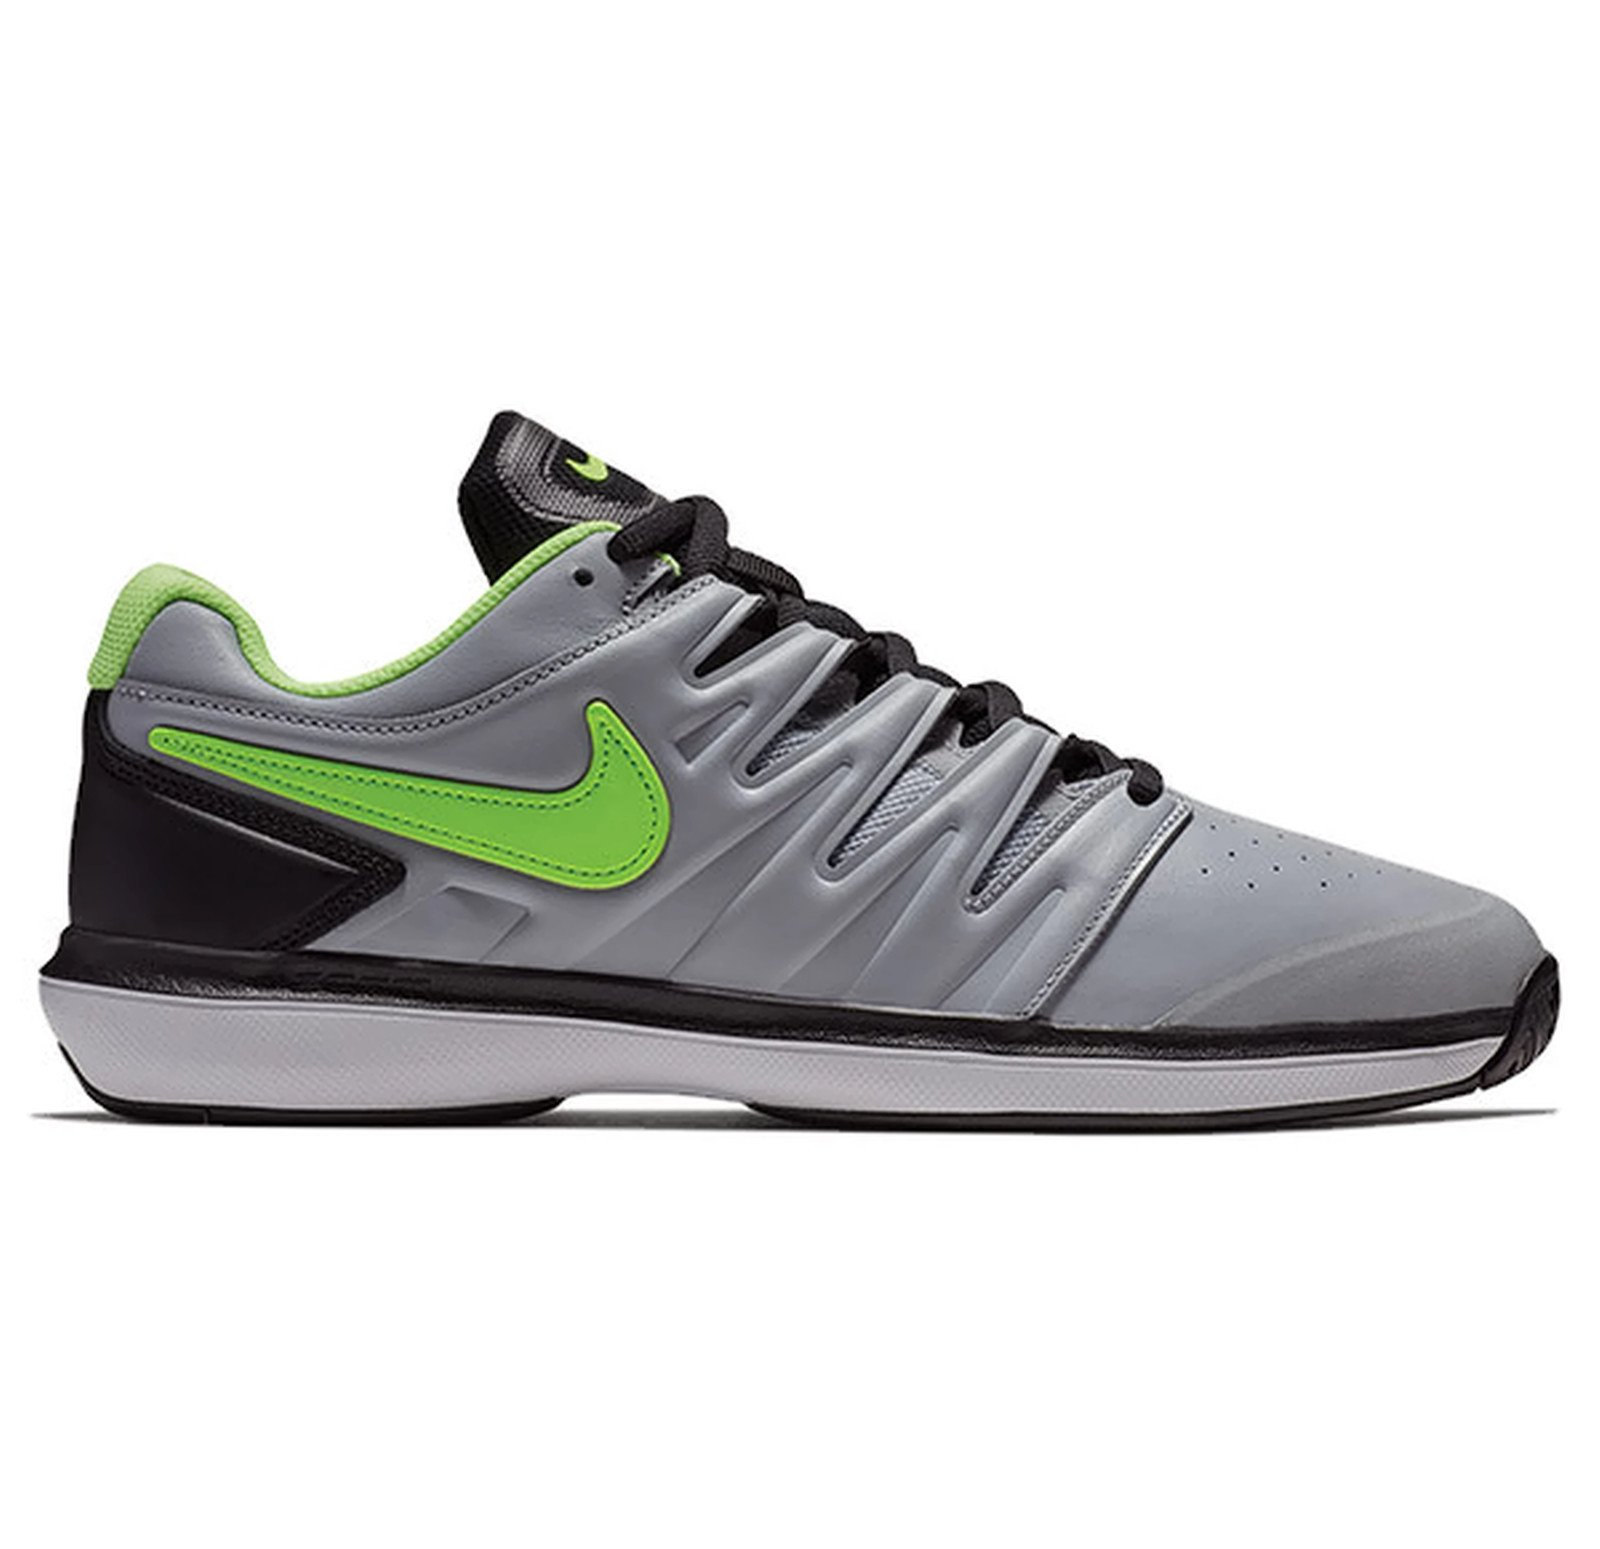 fd8834c9016c2 Galleon - Nike Men s Air Zoom Prestige Tennis Shoes (10 D US ...